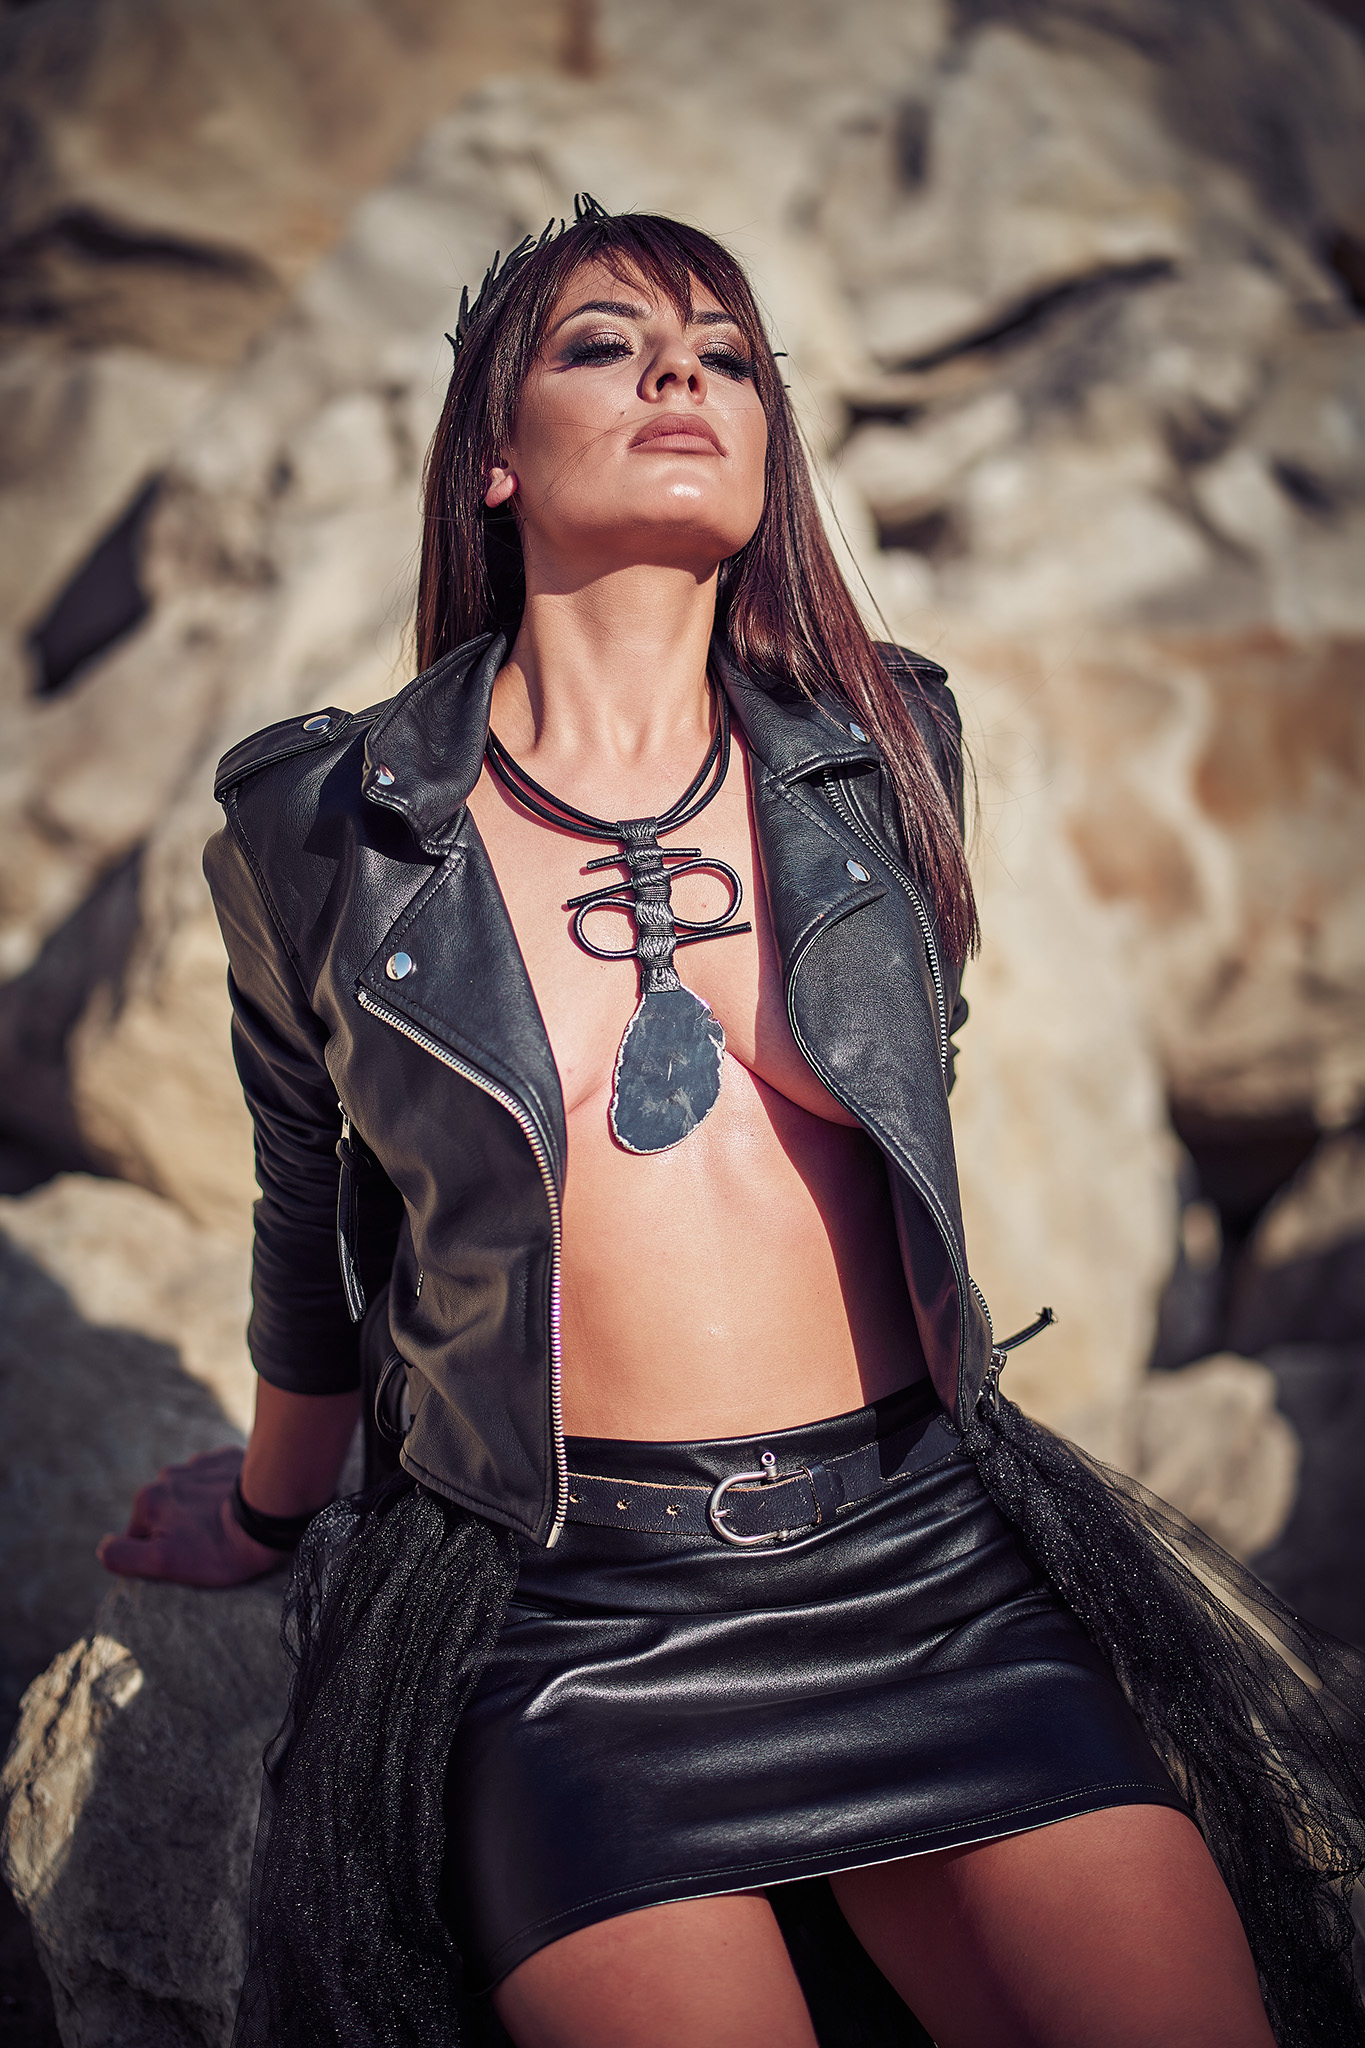 секси фотография на кожени бижута